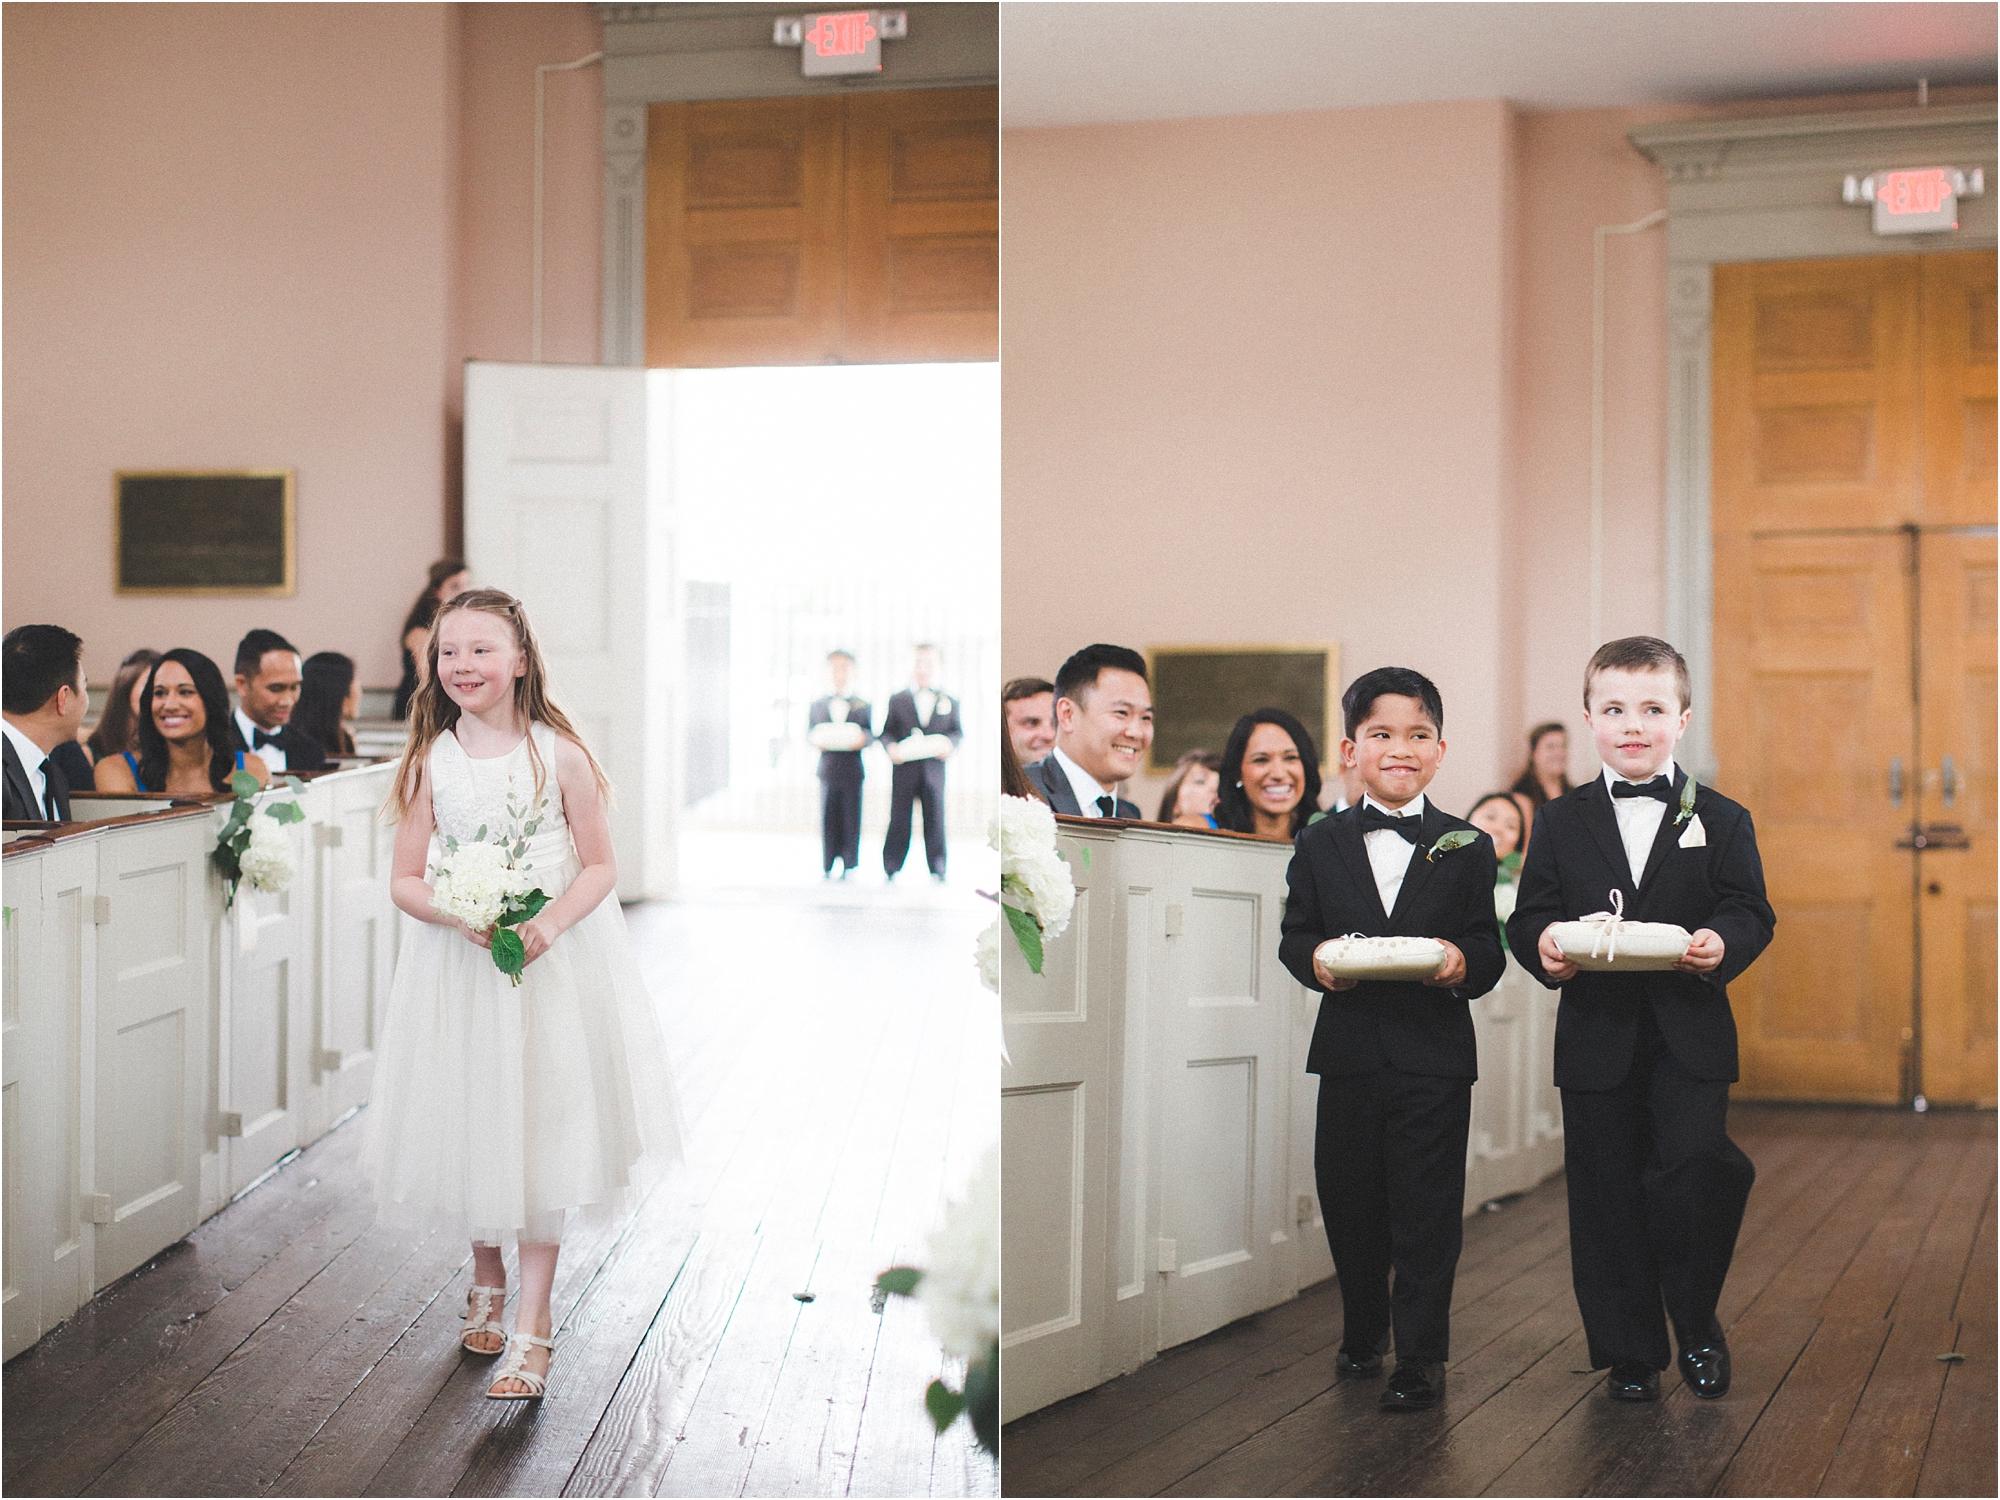 stephanie-yonce-photography-historic-church-virginia-museu-fine-arts-wedding-photos_039.JPG